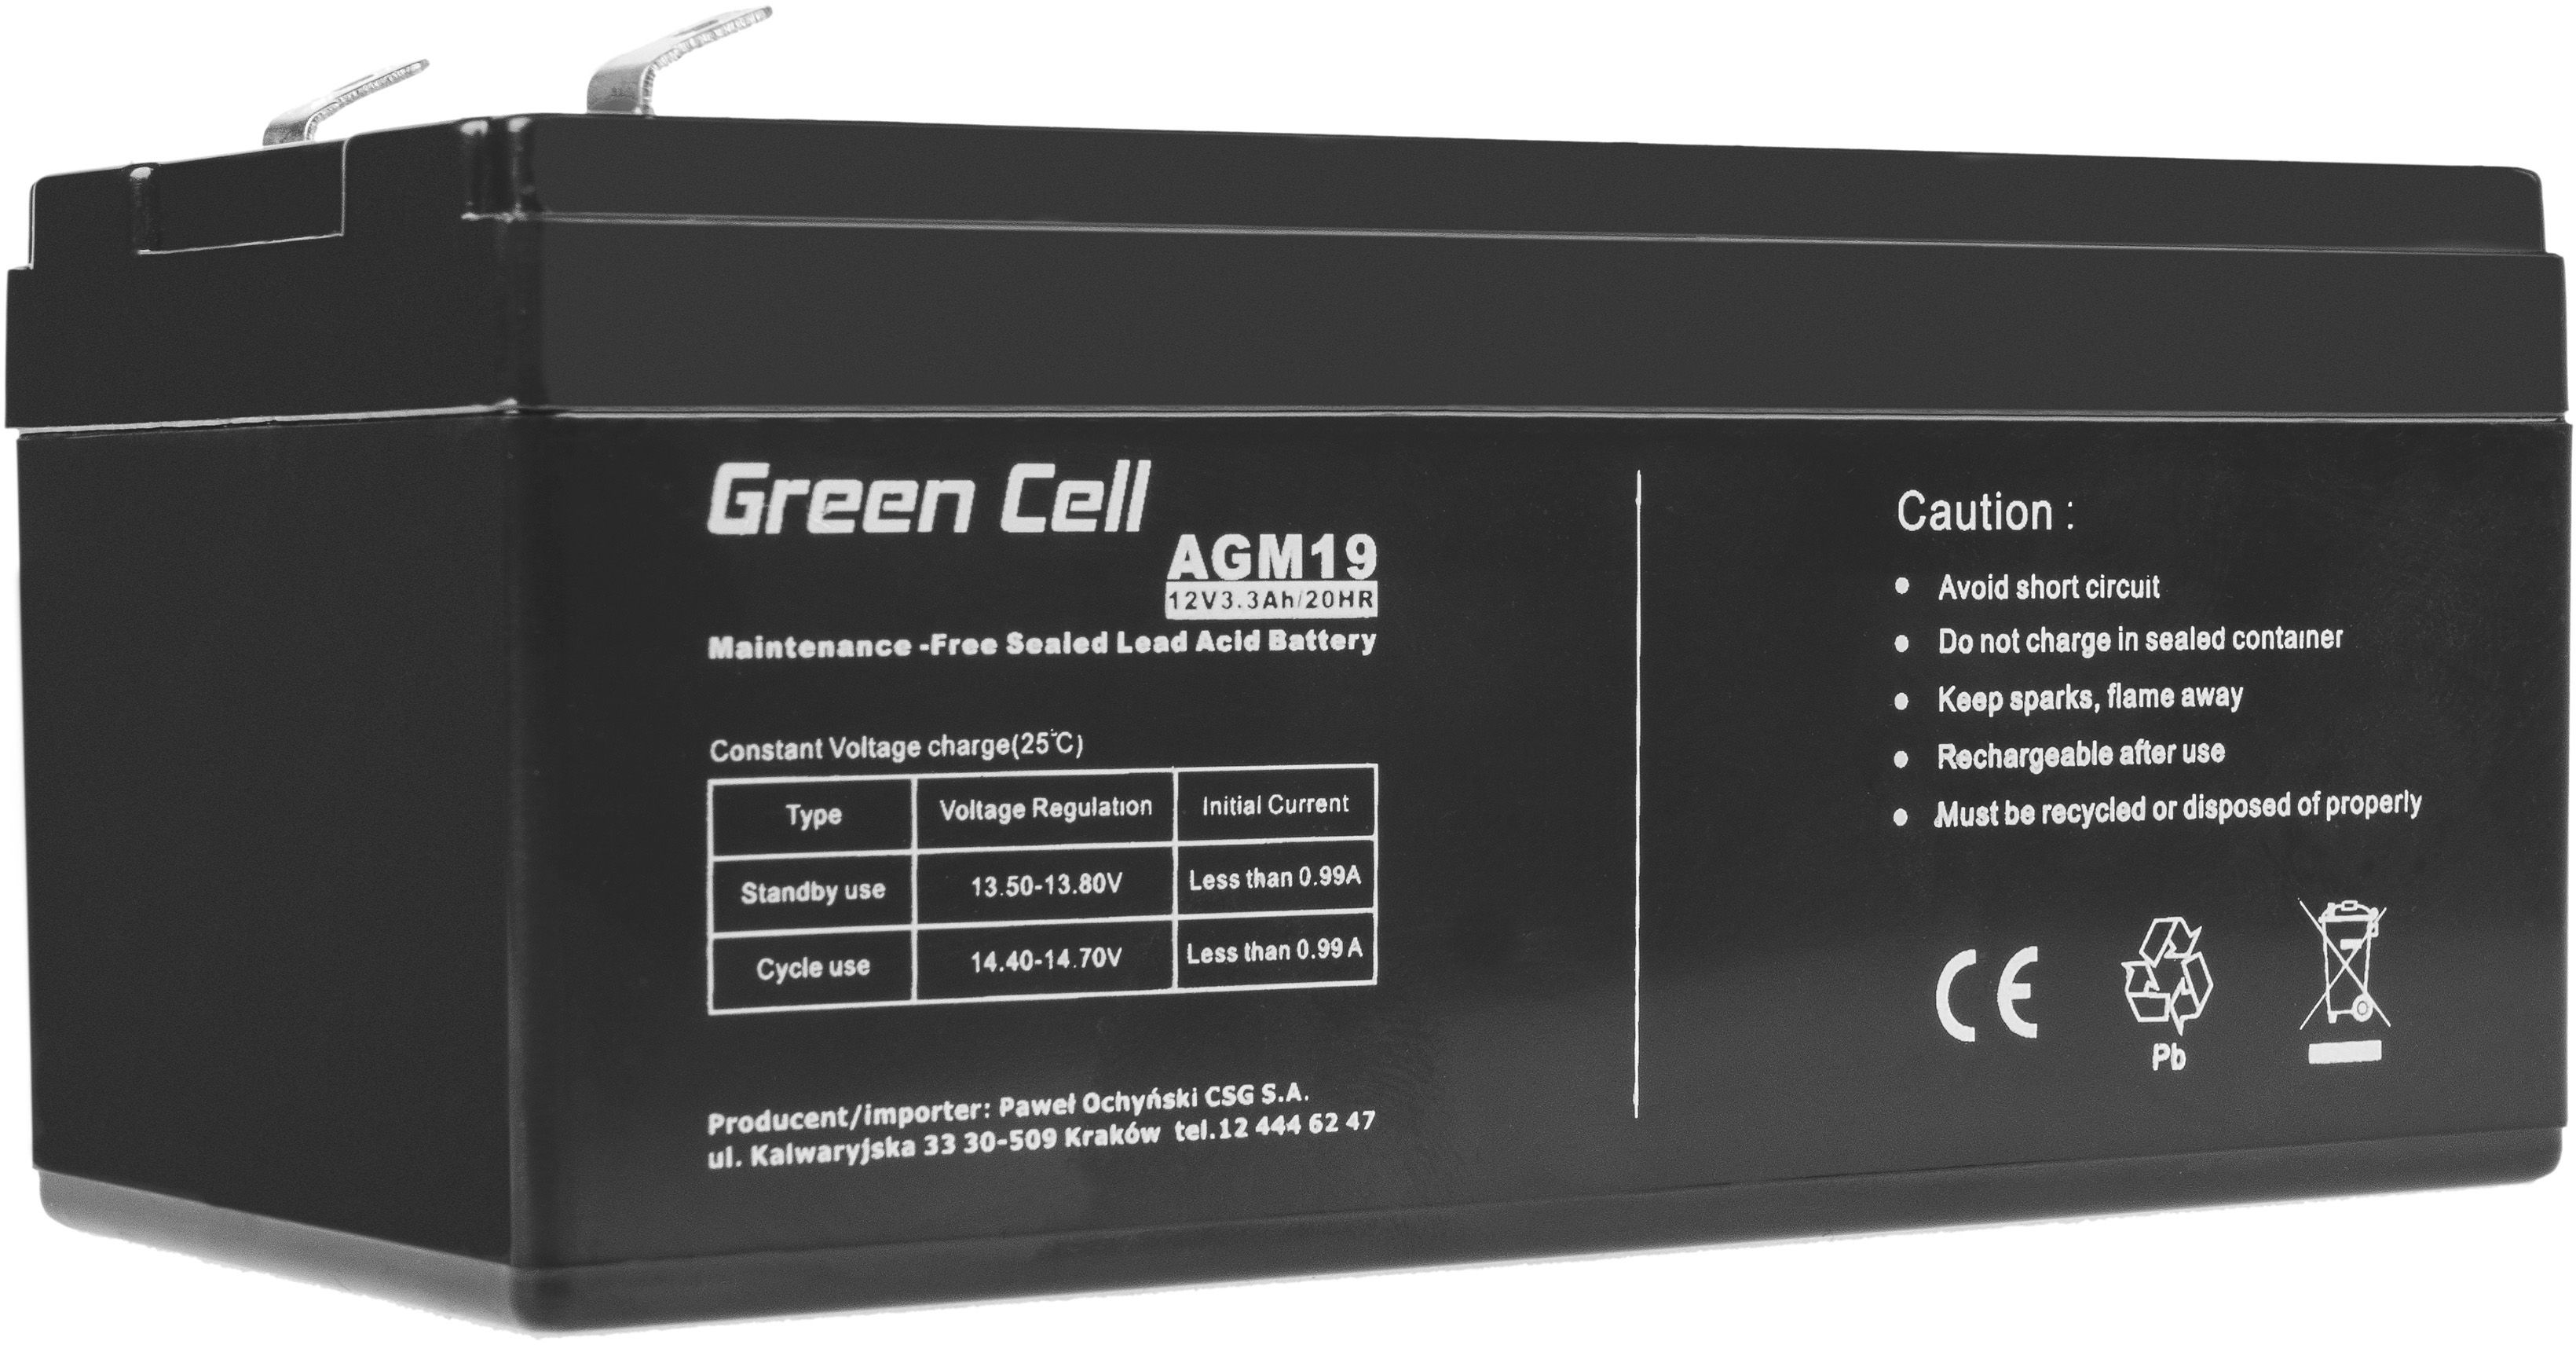 Green Cell AGM VRLA 12V 3.3Ah bezobsługowy akumulator do systemu alarmowego kasy fiskalnej zabawki